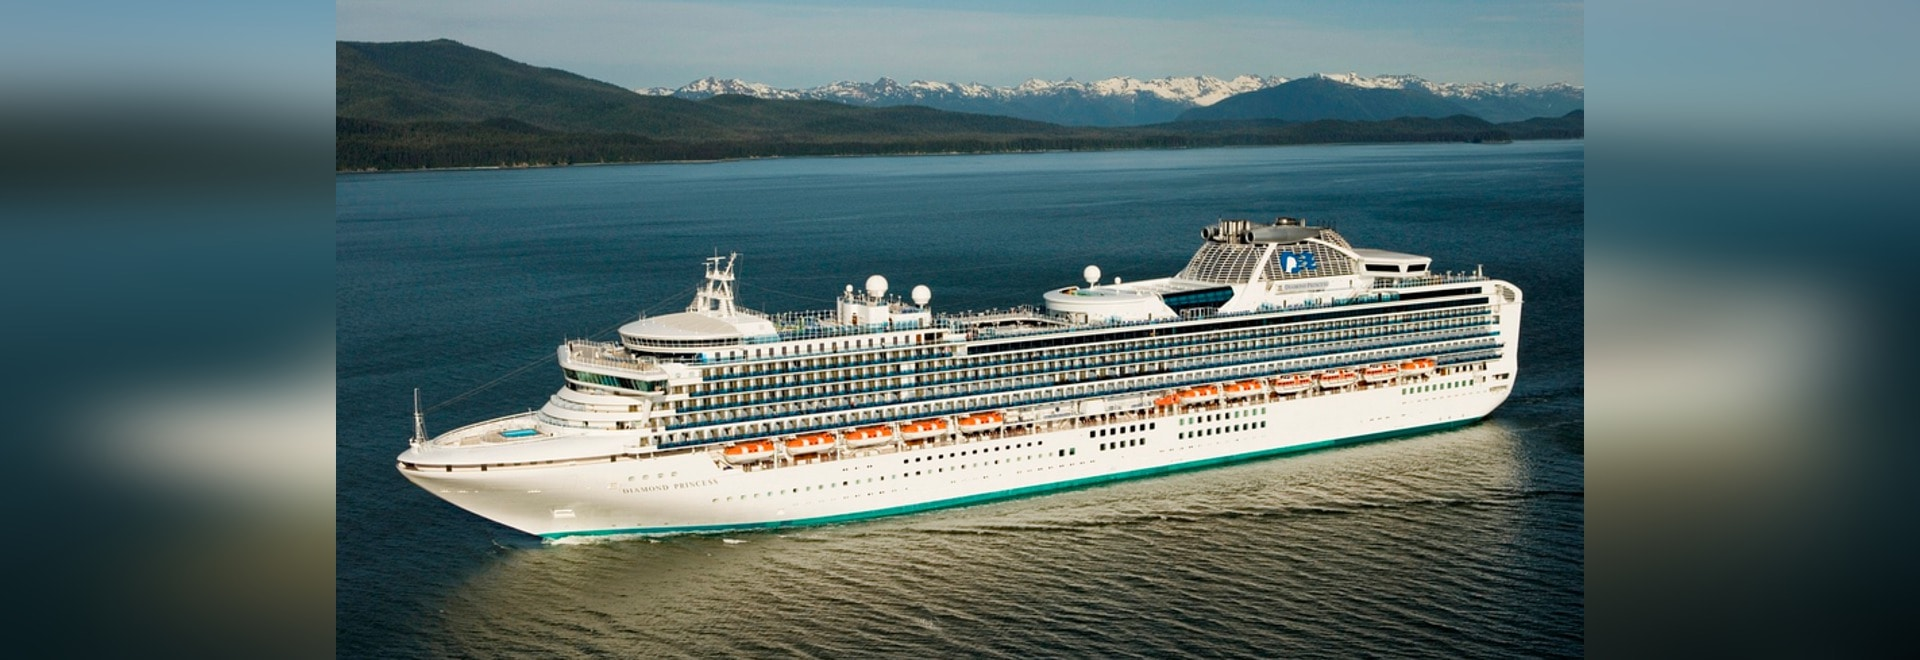 New Zealand Kicks Off Busiest Cruise Season